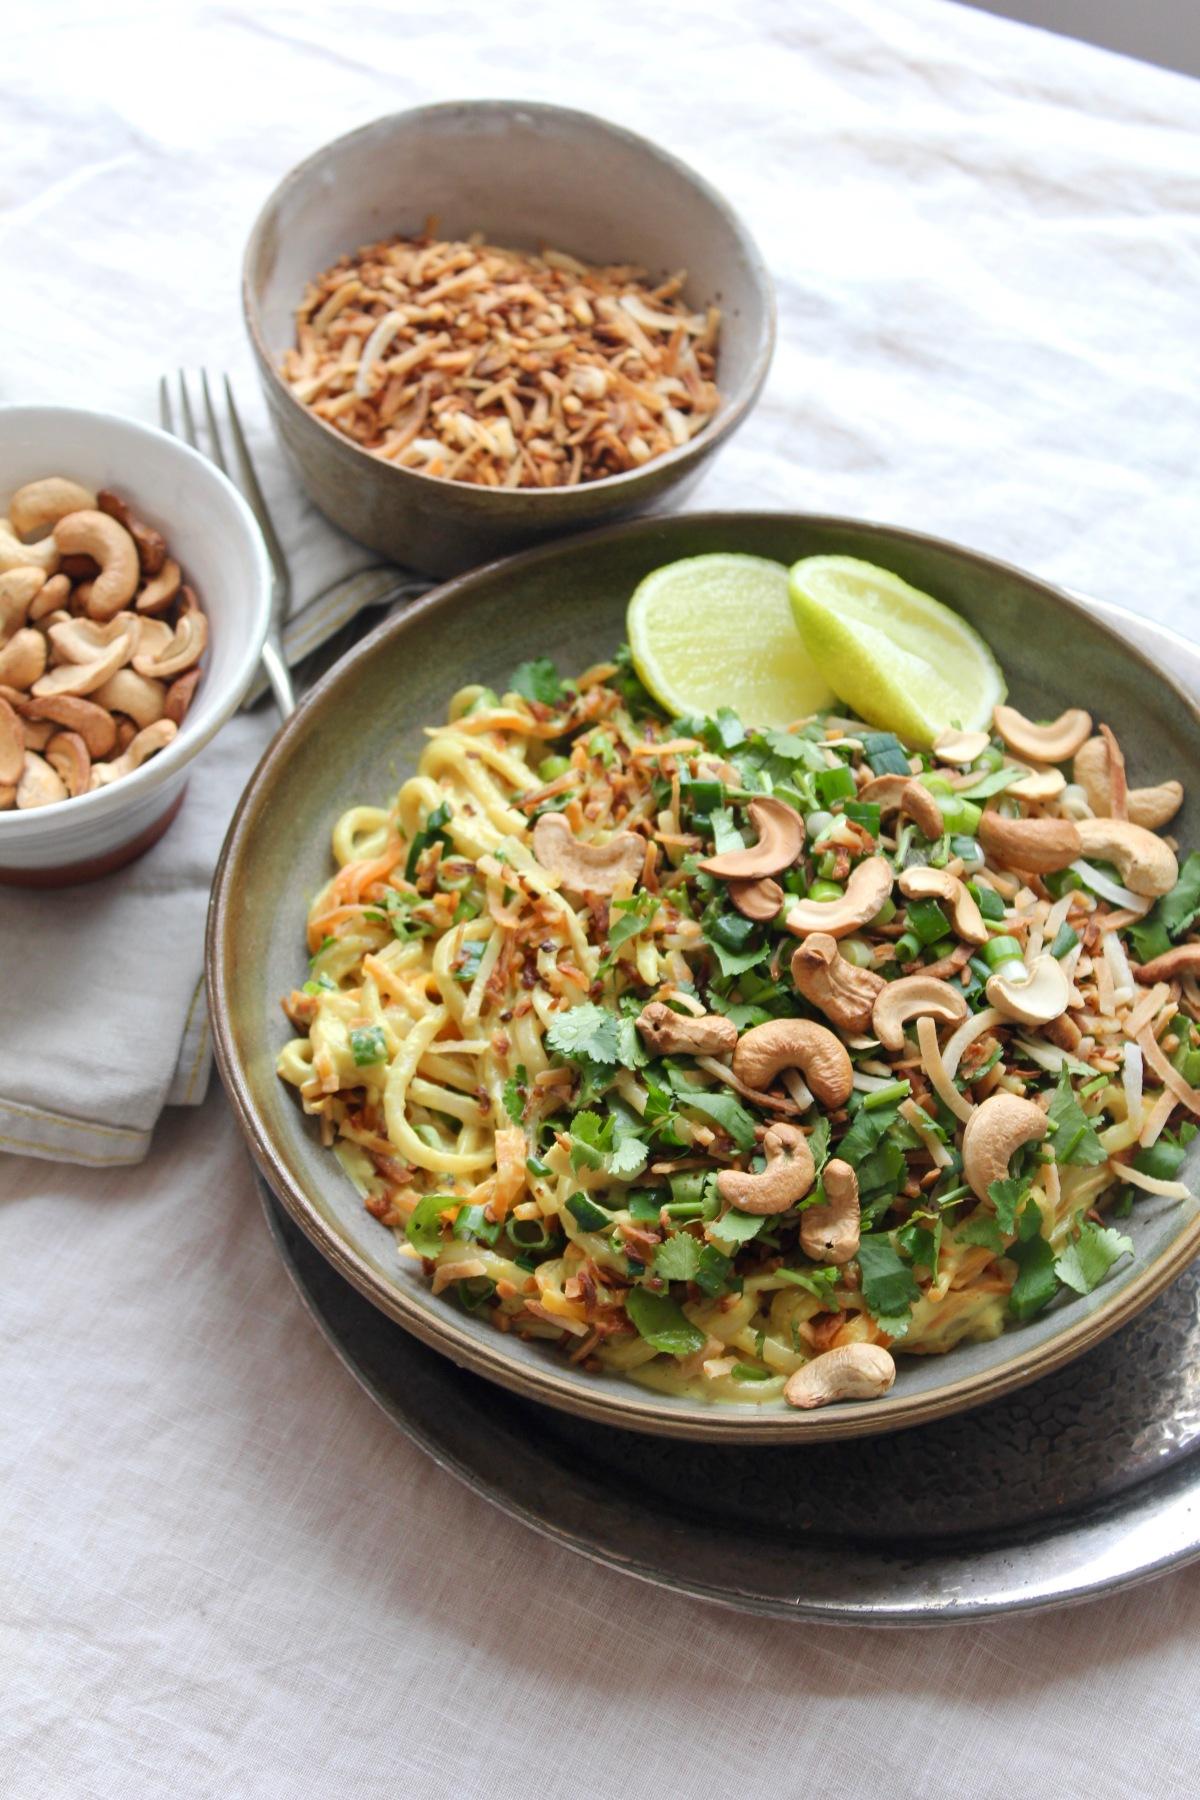 Coconut Turmeric Noodles